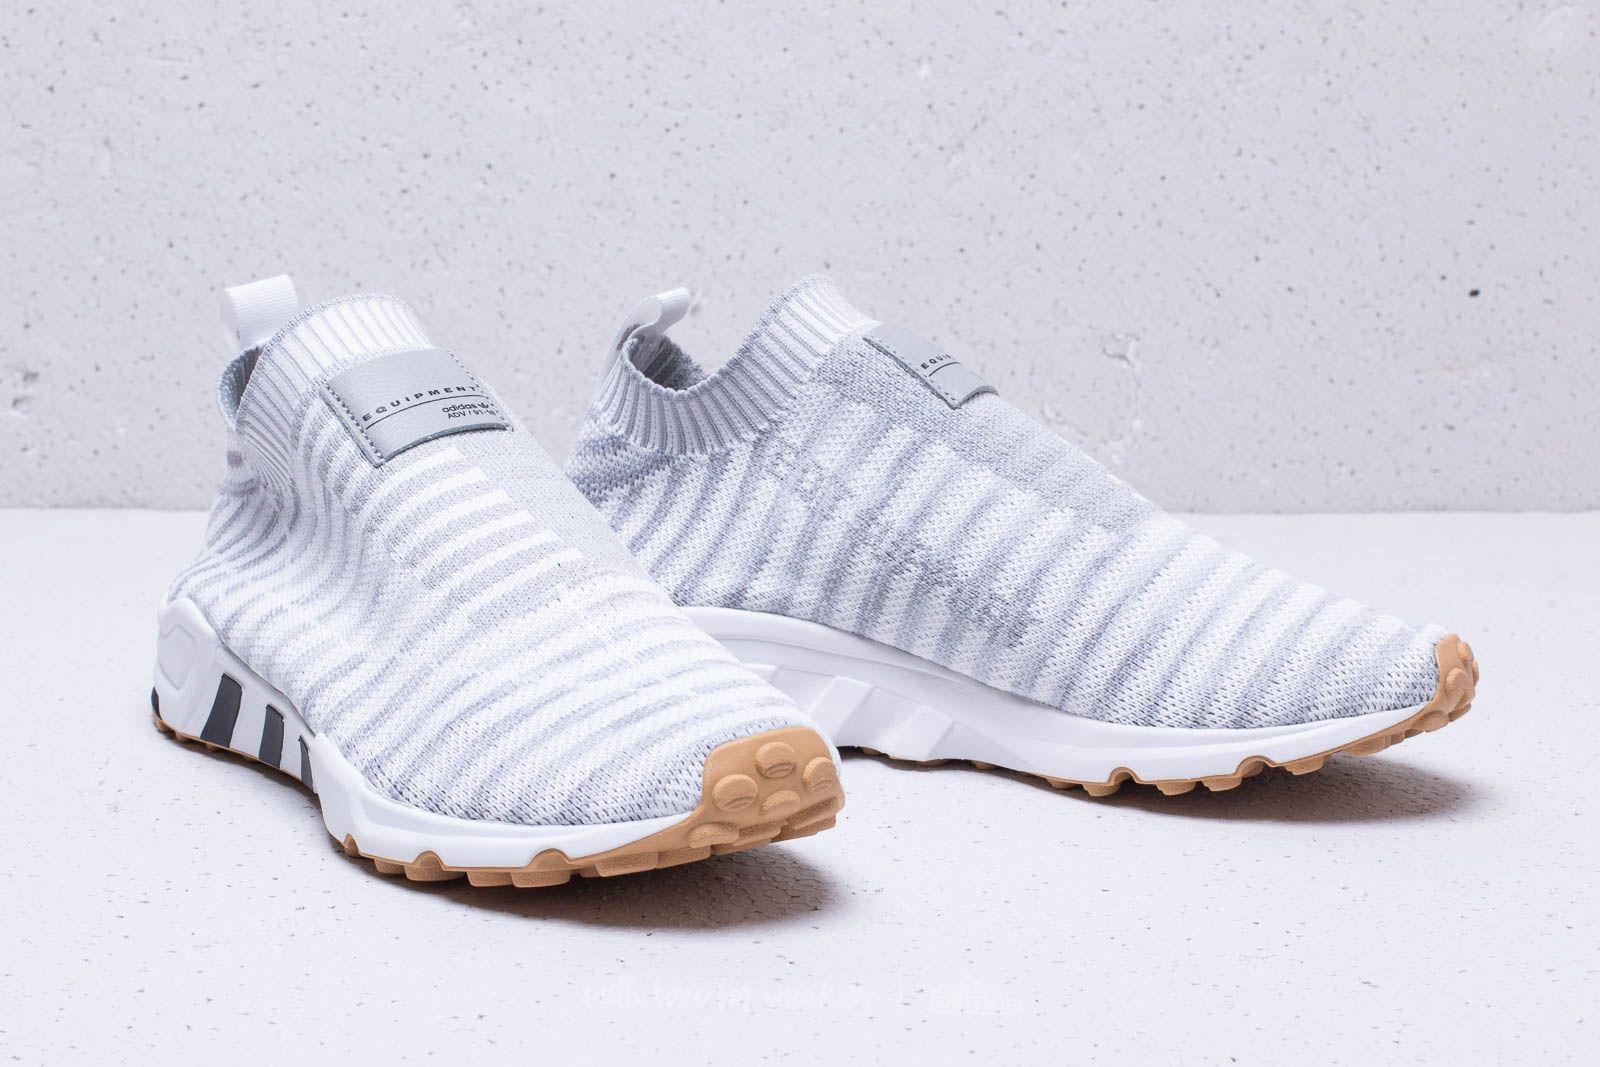 Adidas Originals - Adidas Eqt Support Sk Primeknit W Ftw White  Crystal  White  Gum. View fullscreen feb4ada8d14